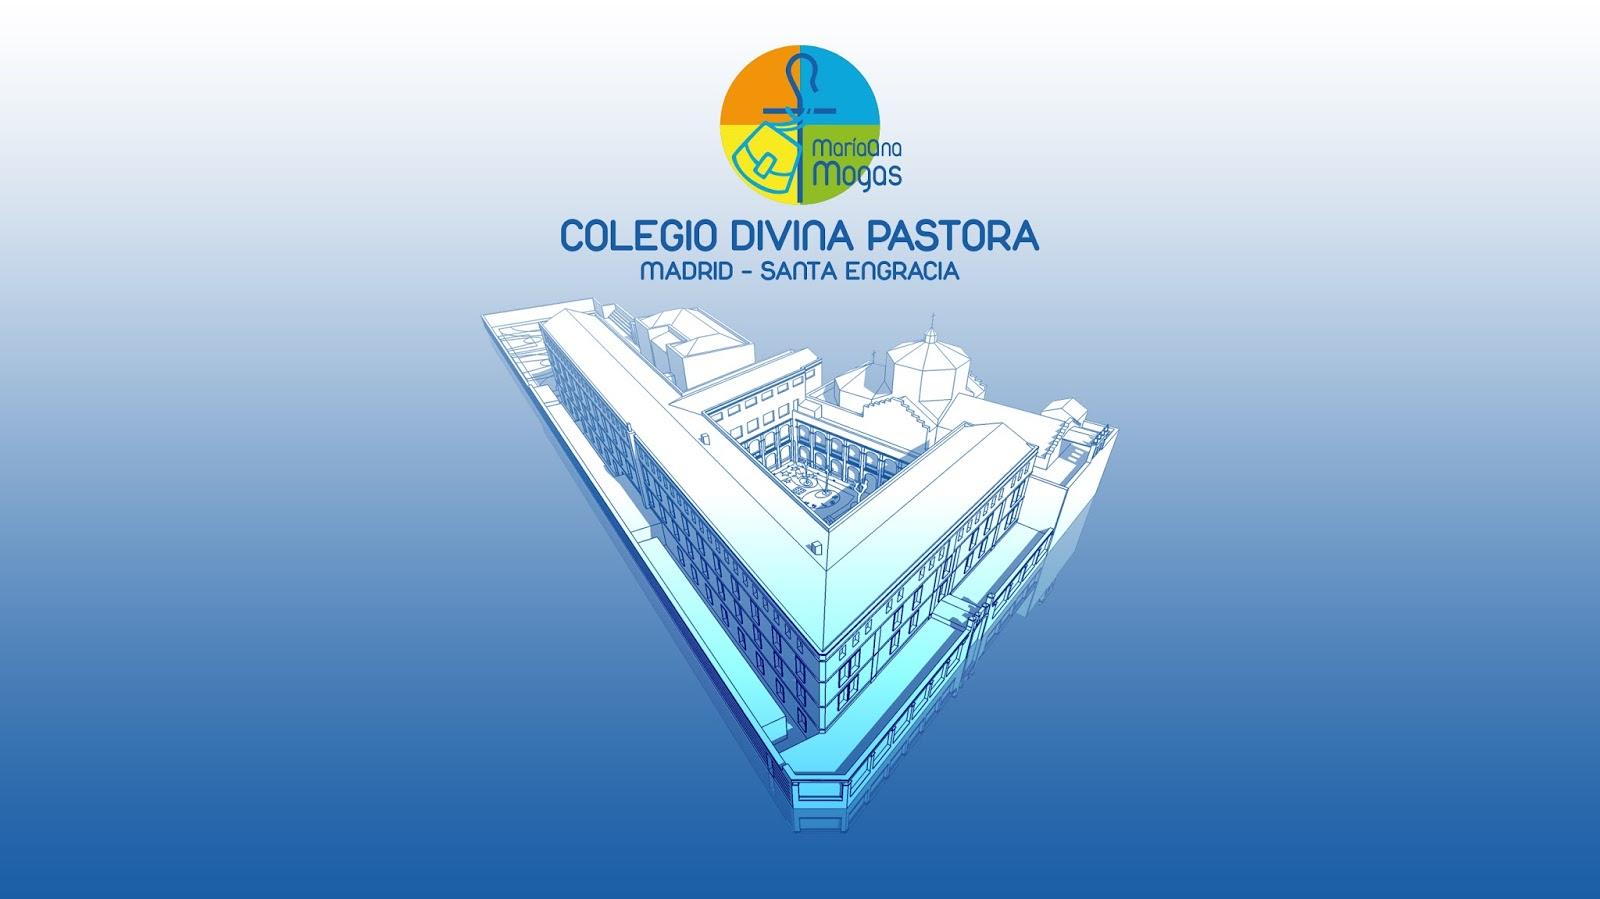 Colegio Divina Pastora - Madrid - Santa Engracia